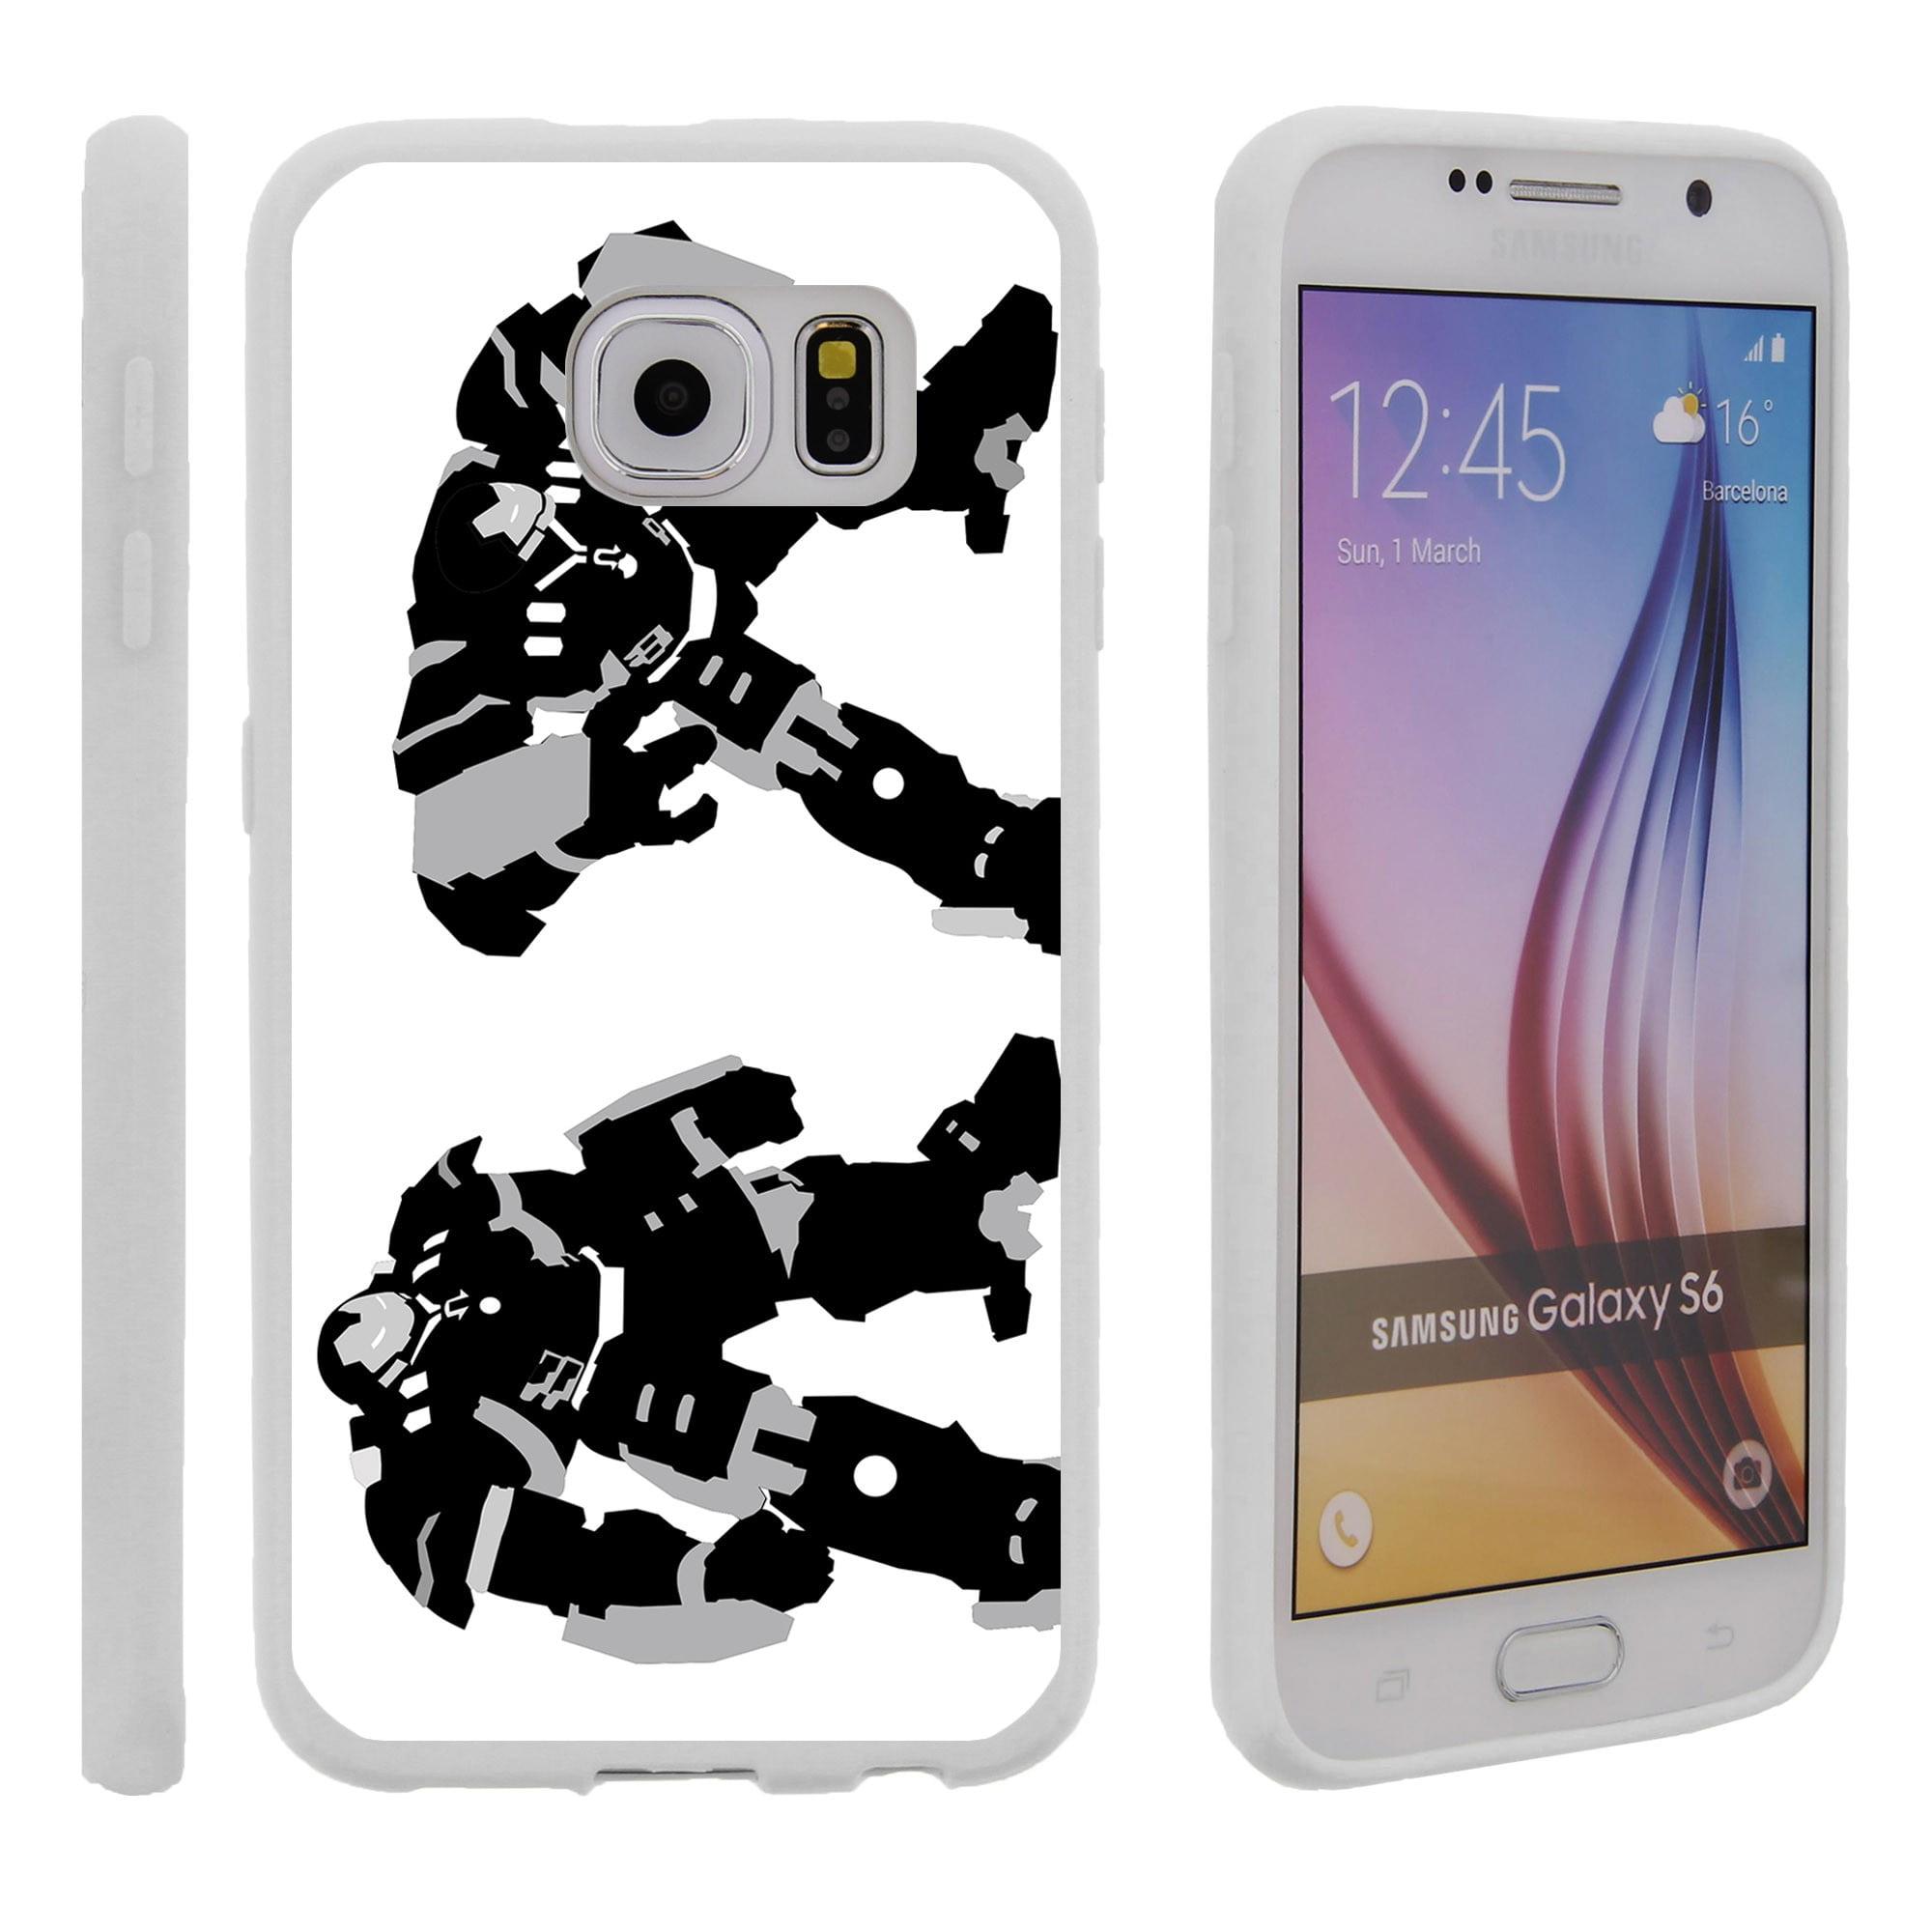 Samsung Galaxy S6 G920, Flexible Case [FLEX FORCE] Slim Durable TPU Sleek Bumper with Unique Designs - Big Iron Man